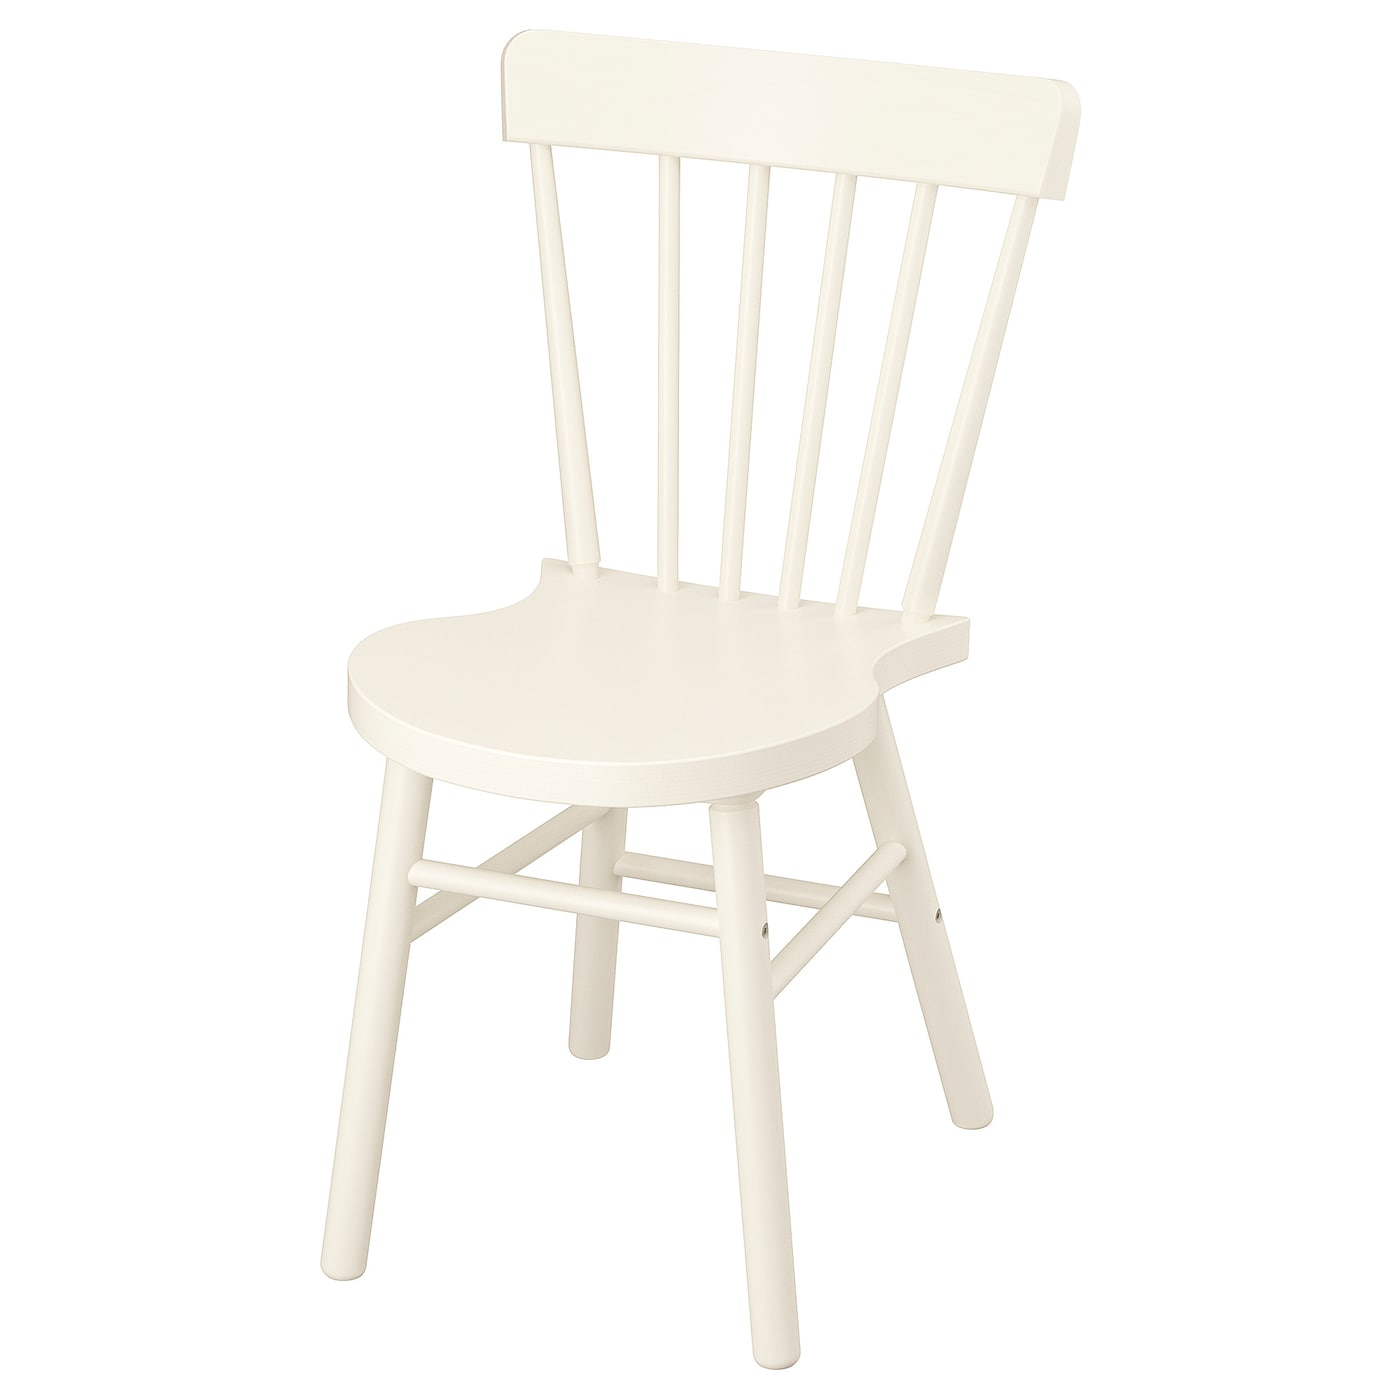 ryd-chair-white__0727339_PE735611_S5